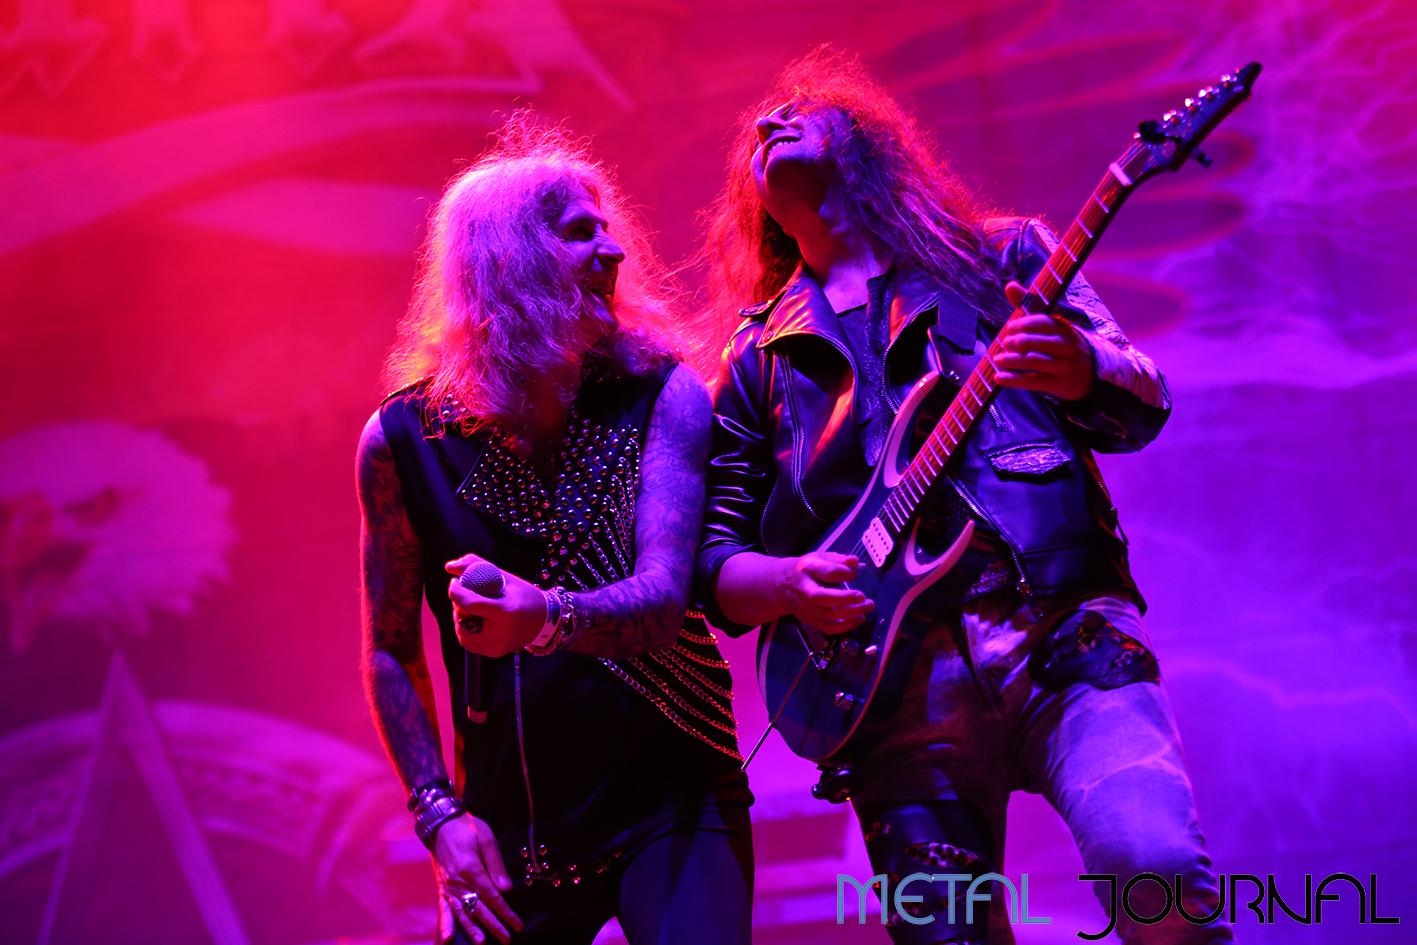 lujuria - leyendas del rock 2019 metal journal pic 2